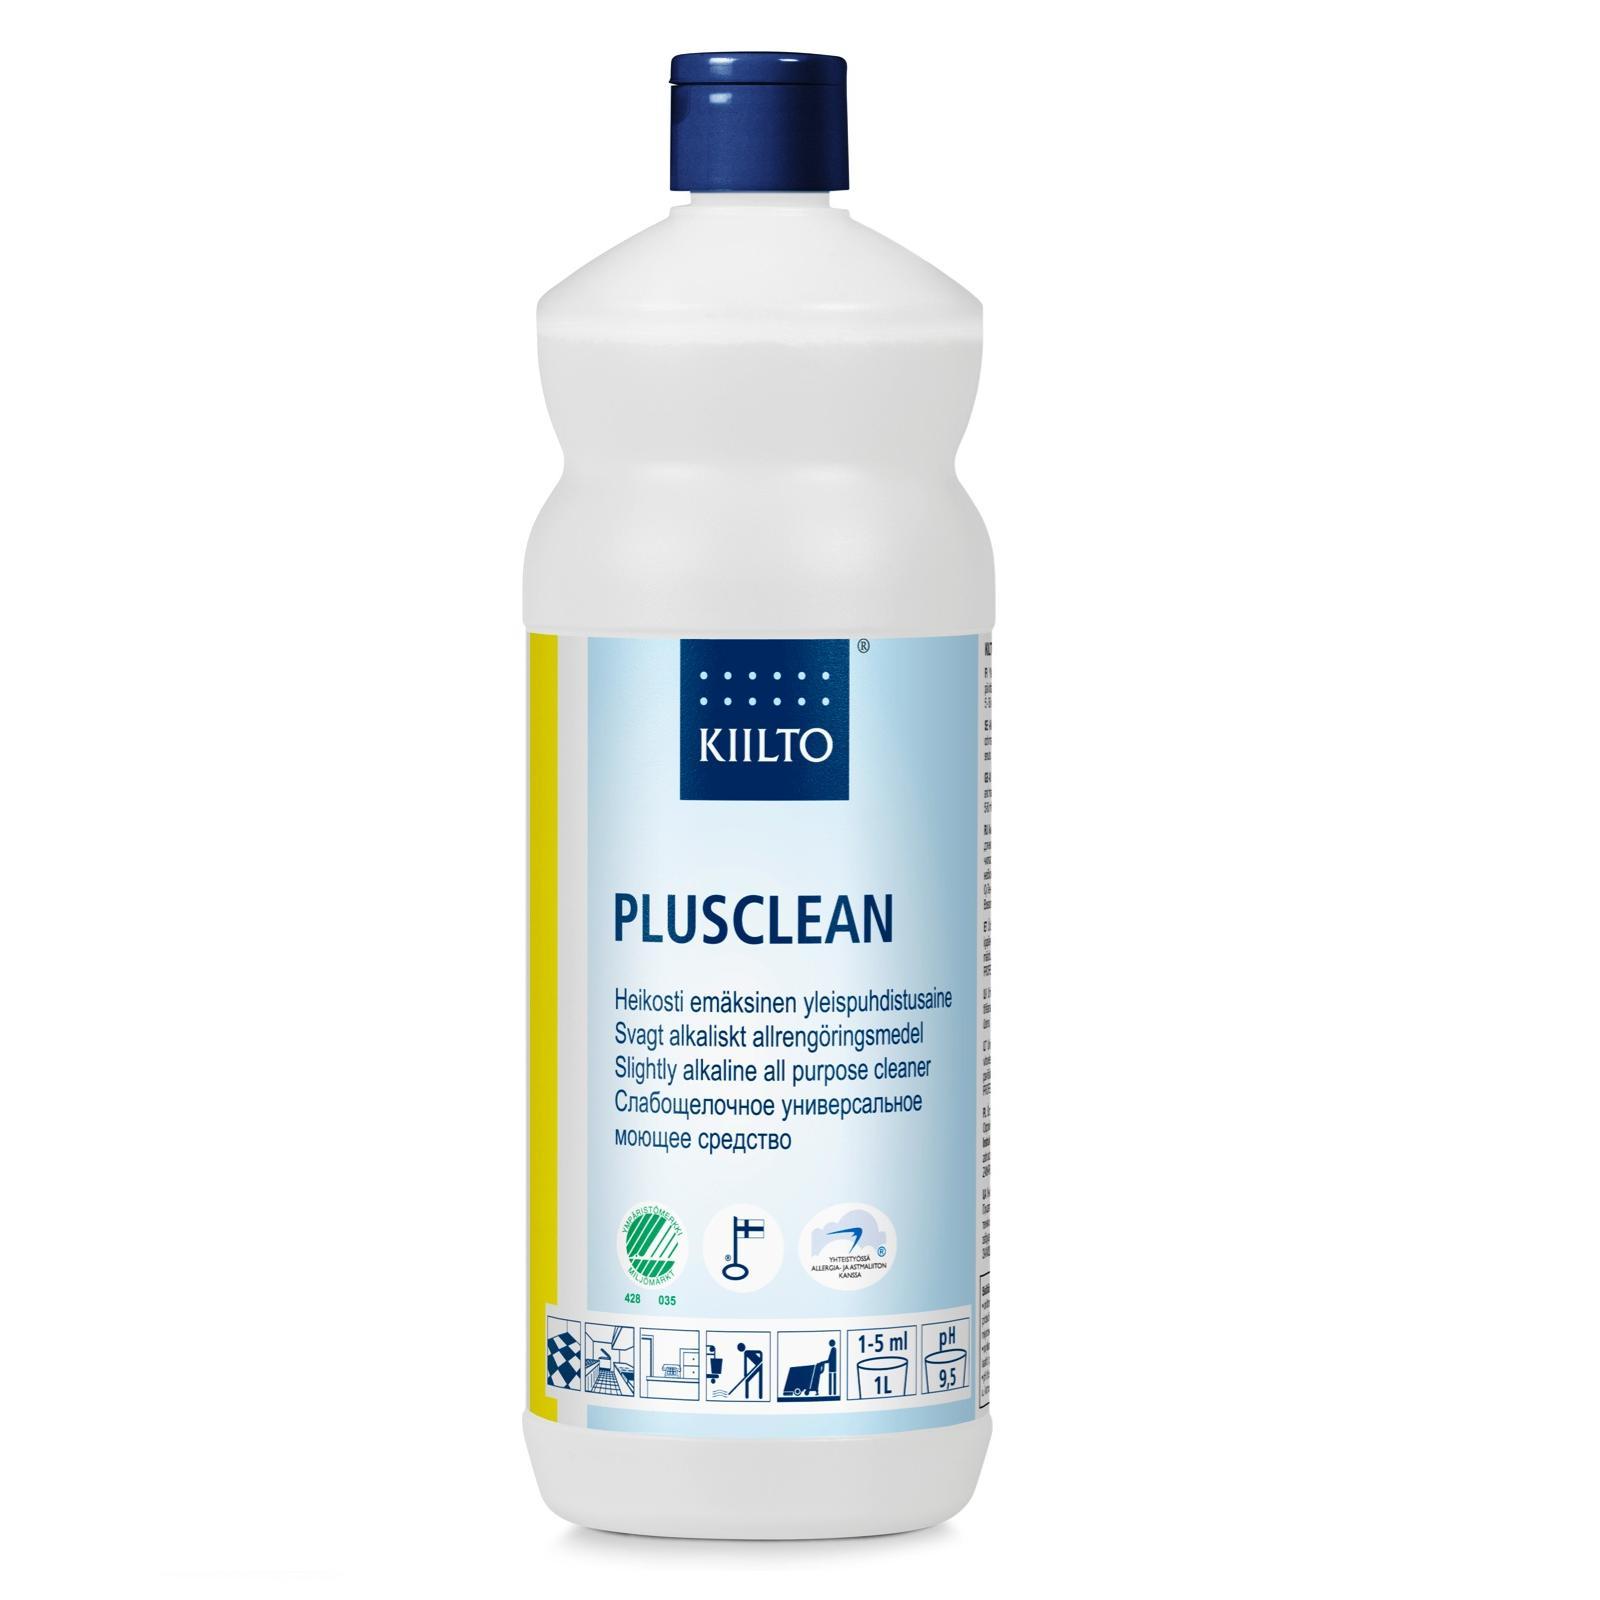 Kiilto Plusclean Yleispuhdistusaine 1 l